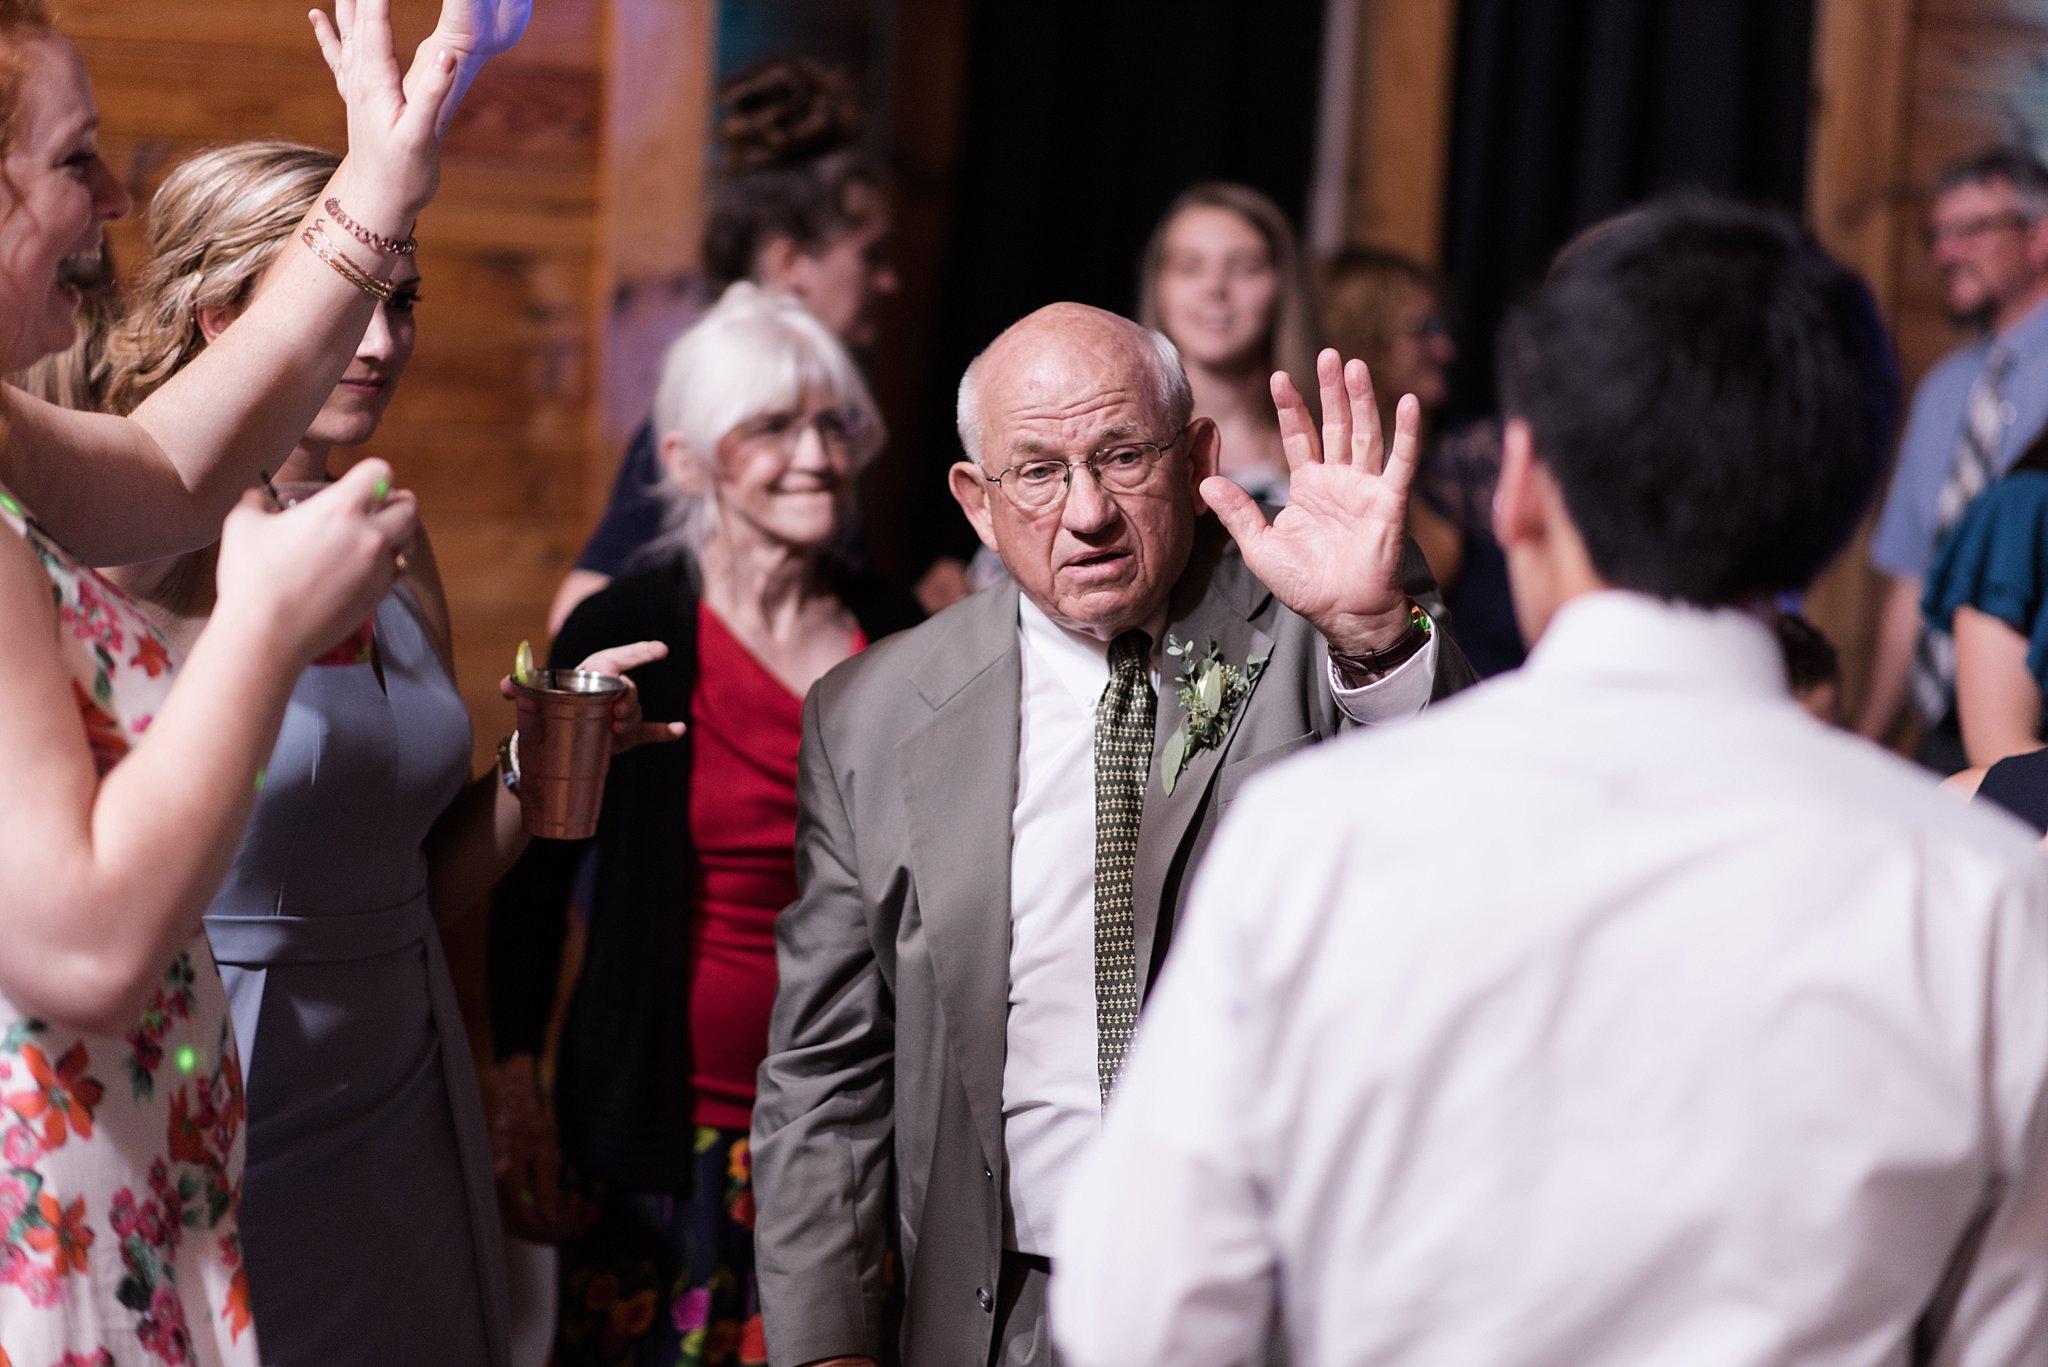 Cadillac-Michigan-wedding-caberfae-peaks-milwaukee-photographer_0100.jpg